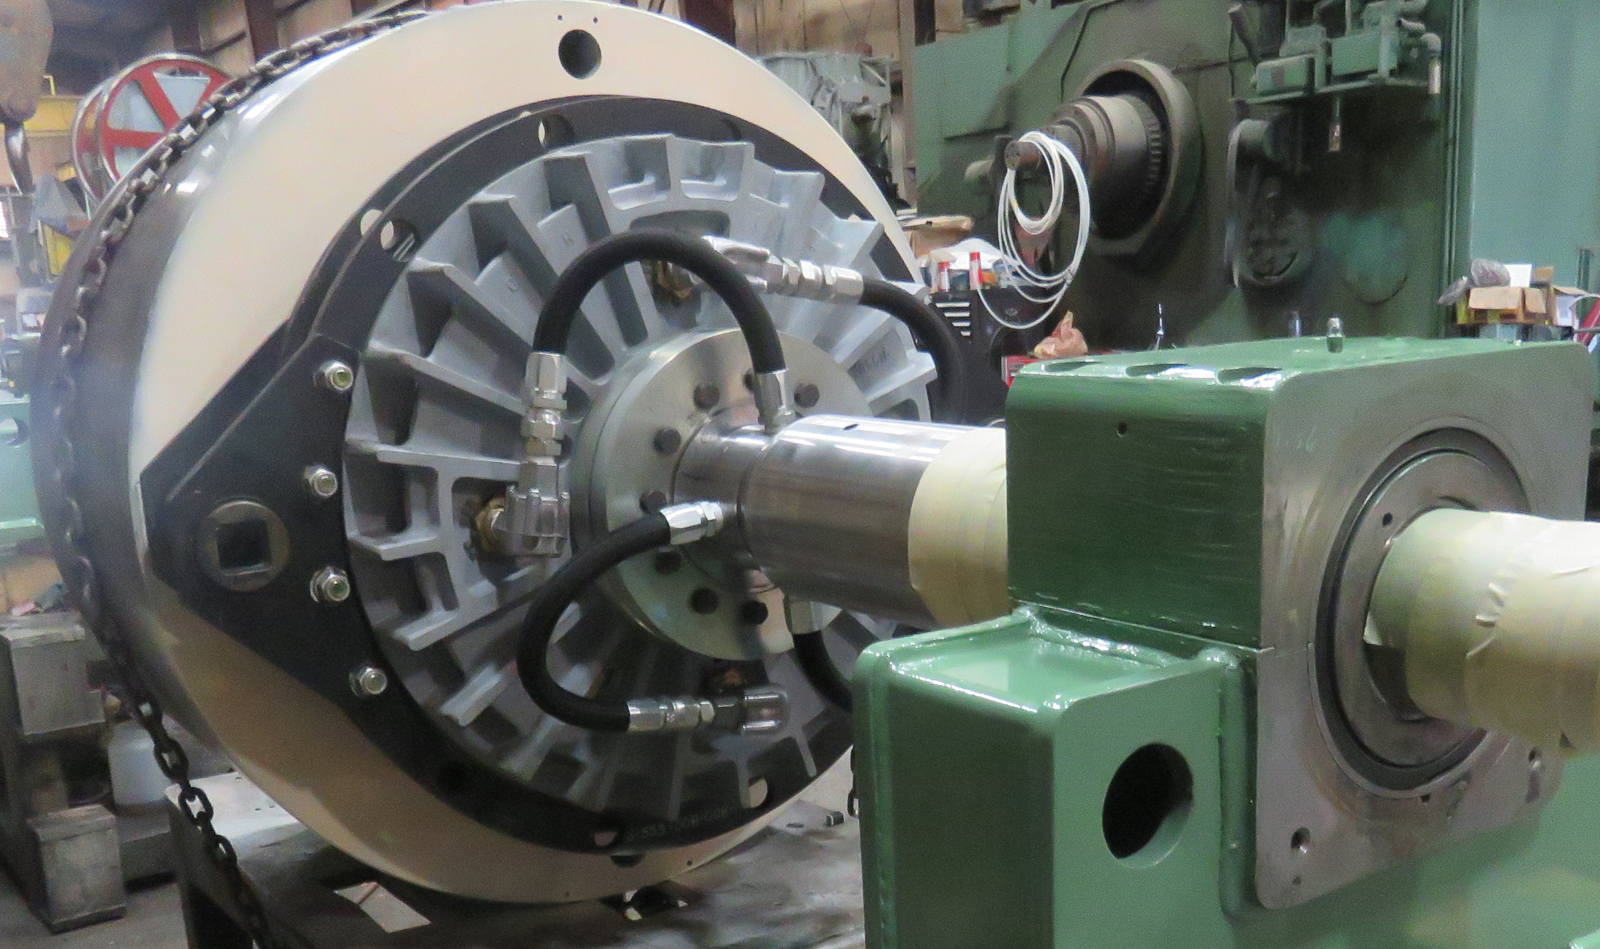 Press Clutch and Brake conversions